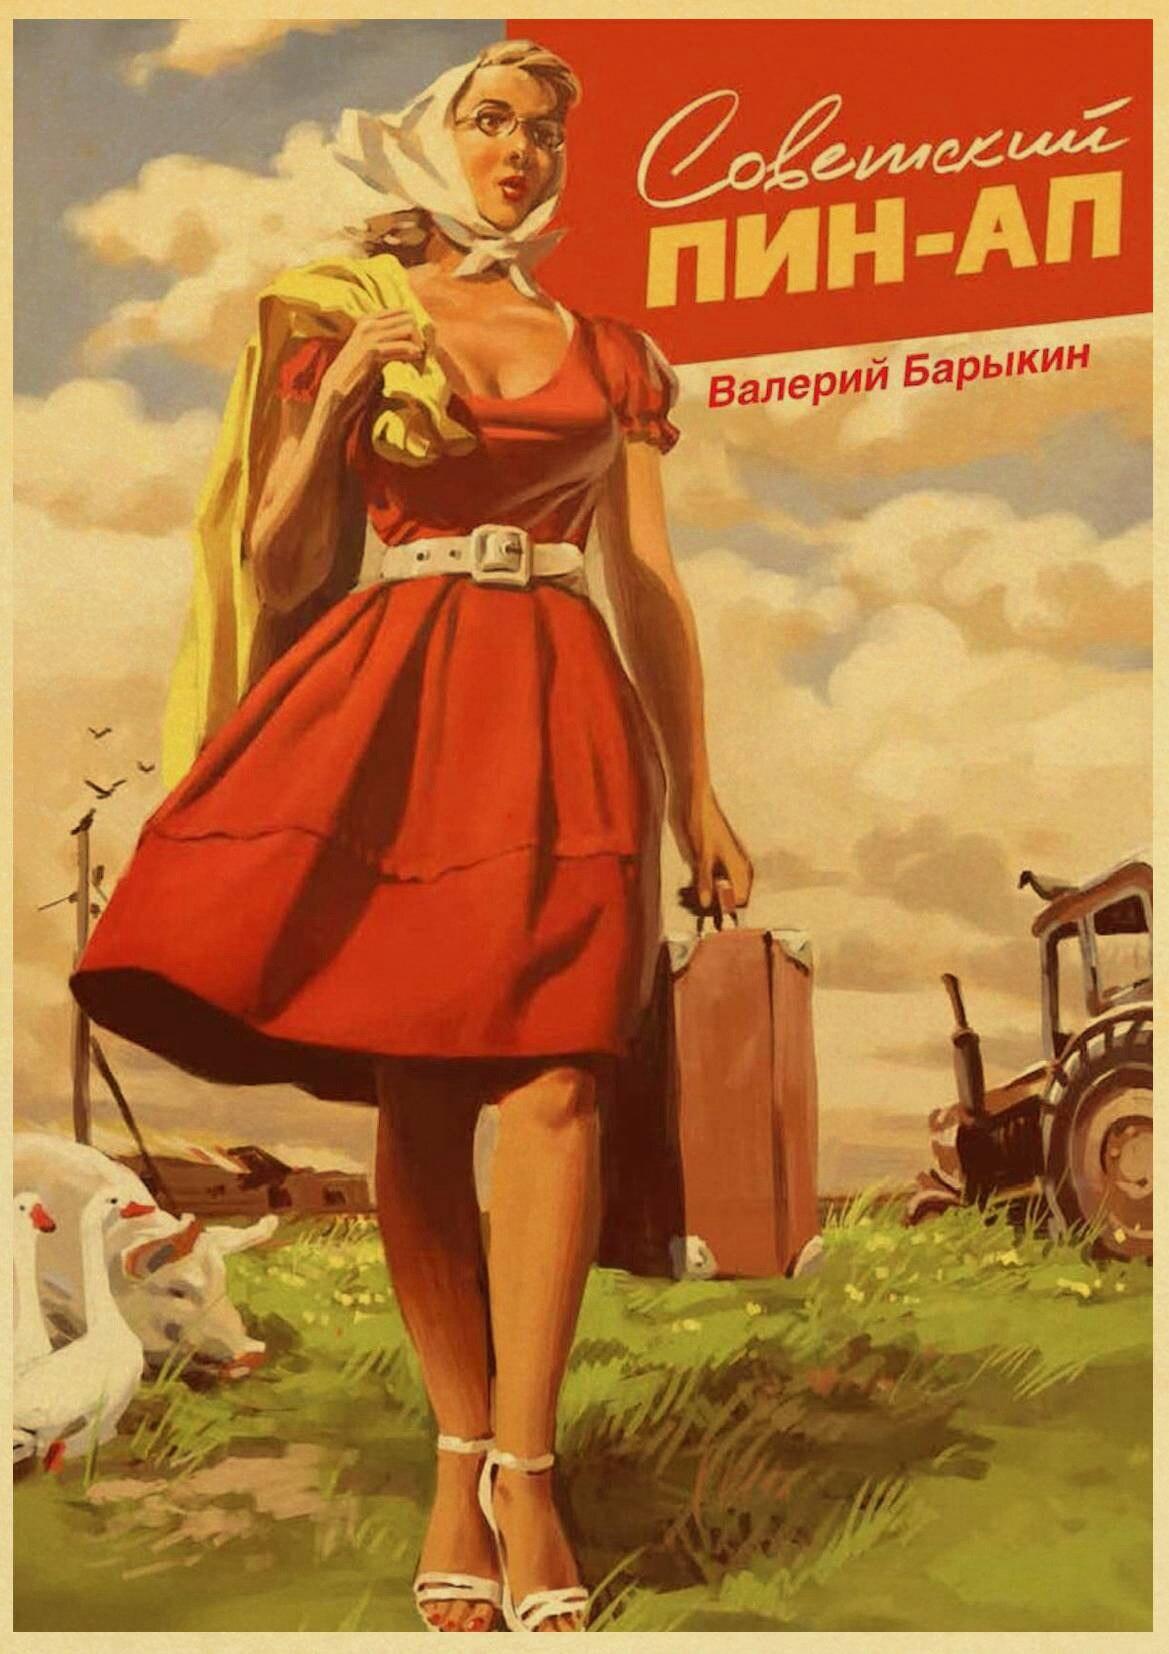 HTB1vPDuX2jsK1Rjy1Xaq6zispXaR Stalin USSR CCCP Retro Poster Good Quality Printed Wall Retro Posters For Home Bar Cafe Room Wall sticker